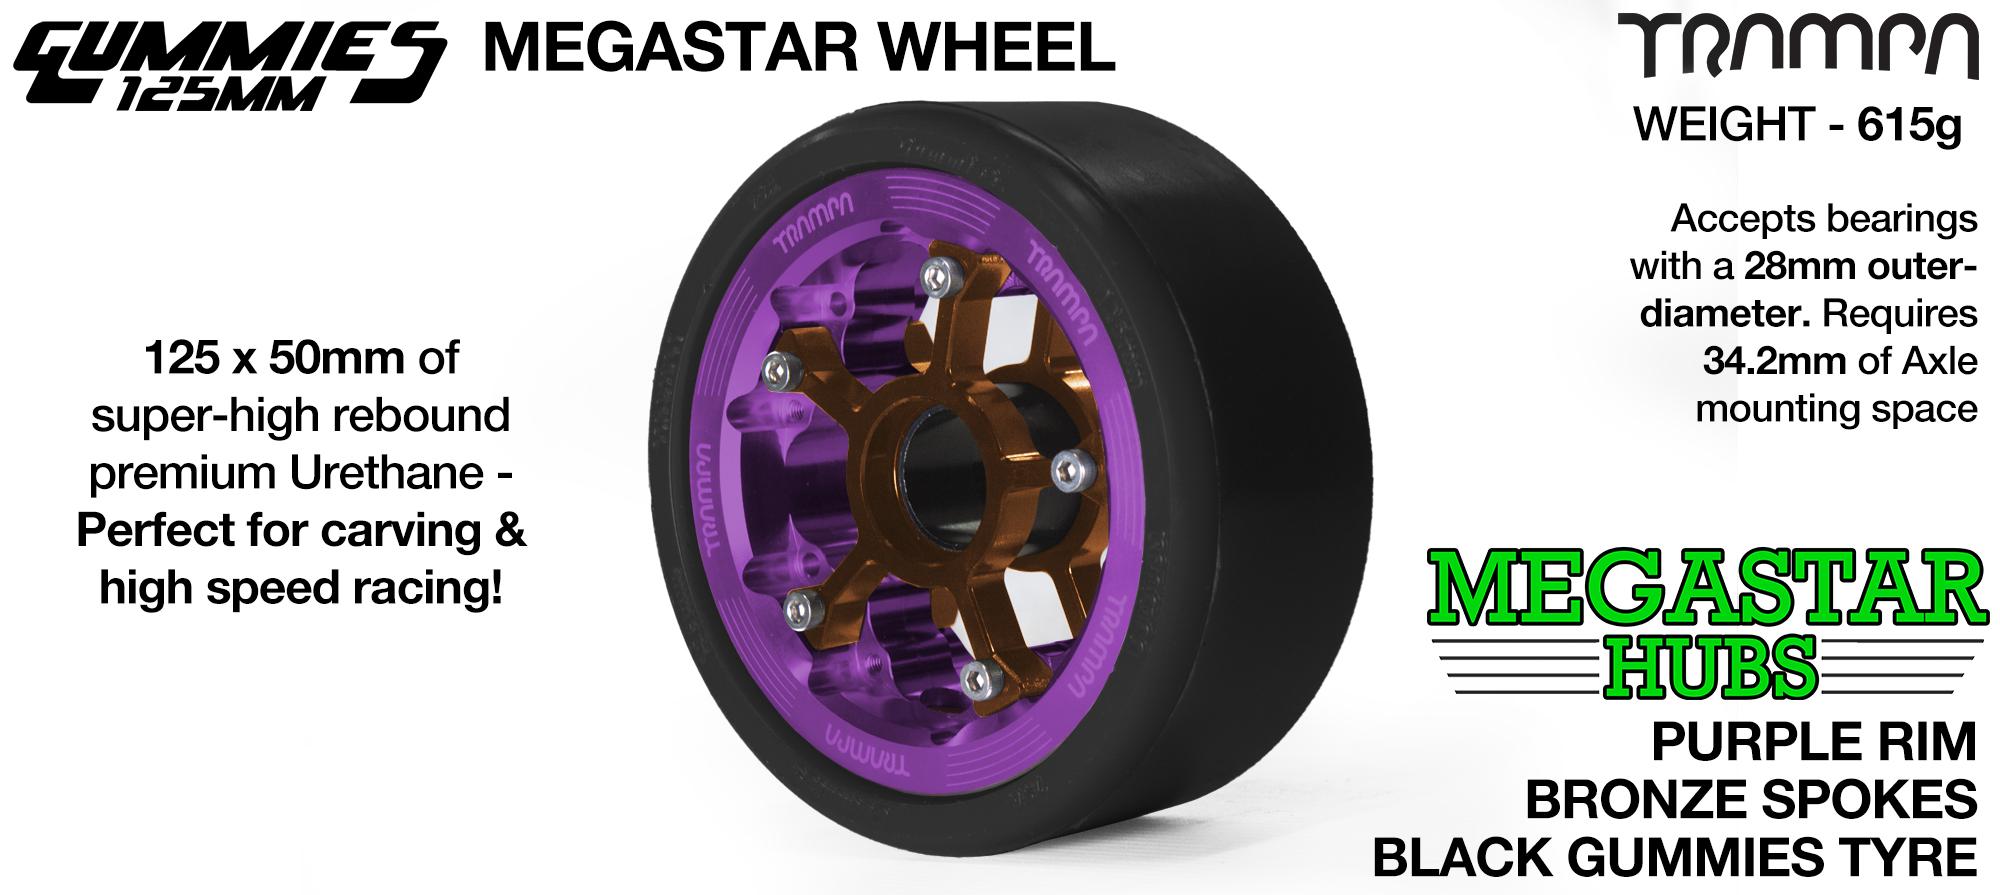 PURPLE MEGASTAR Rim with BRONZE Spokes & BLACK Gummies - The Ulrimate Longboard Wheel